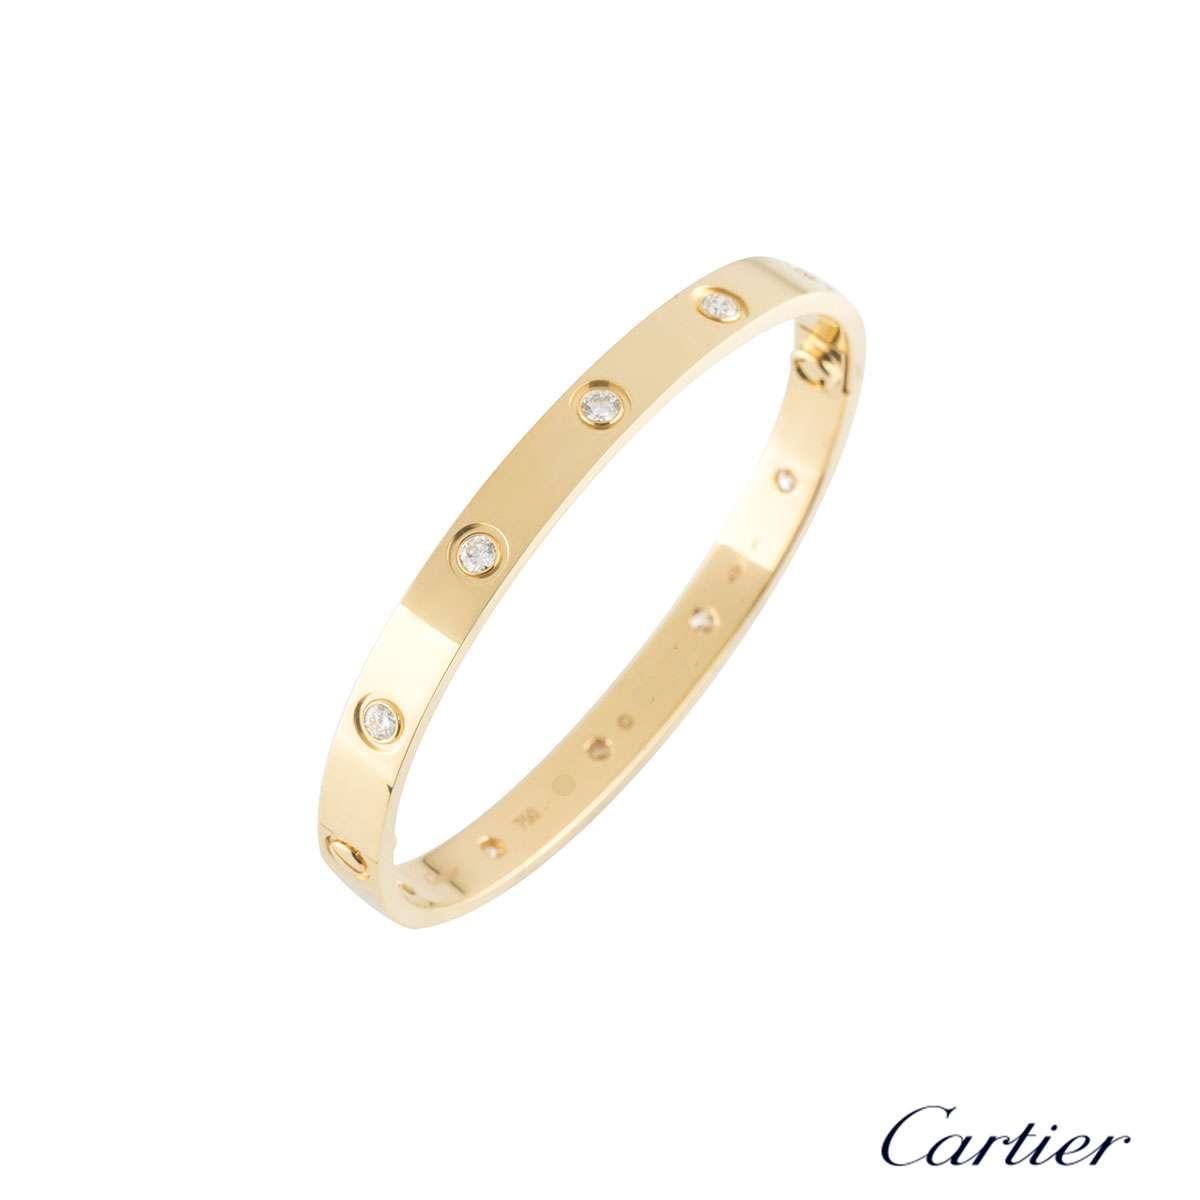 CartierYellow Gold Full Diamond Love Bracelet Size 19 B6040519